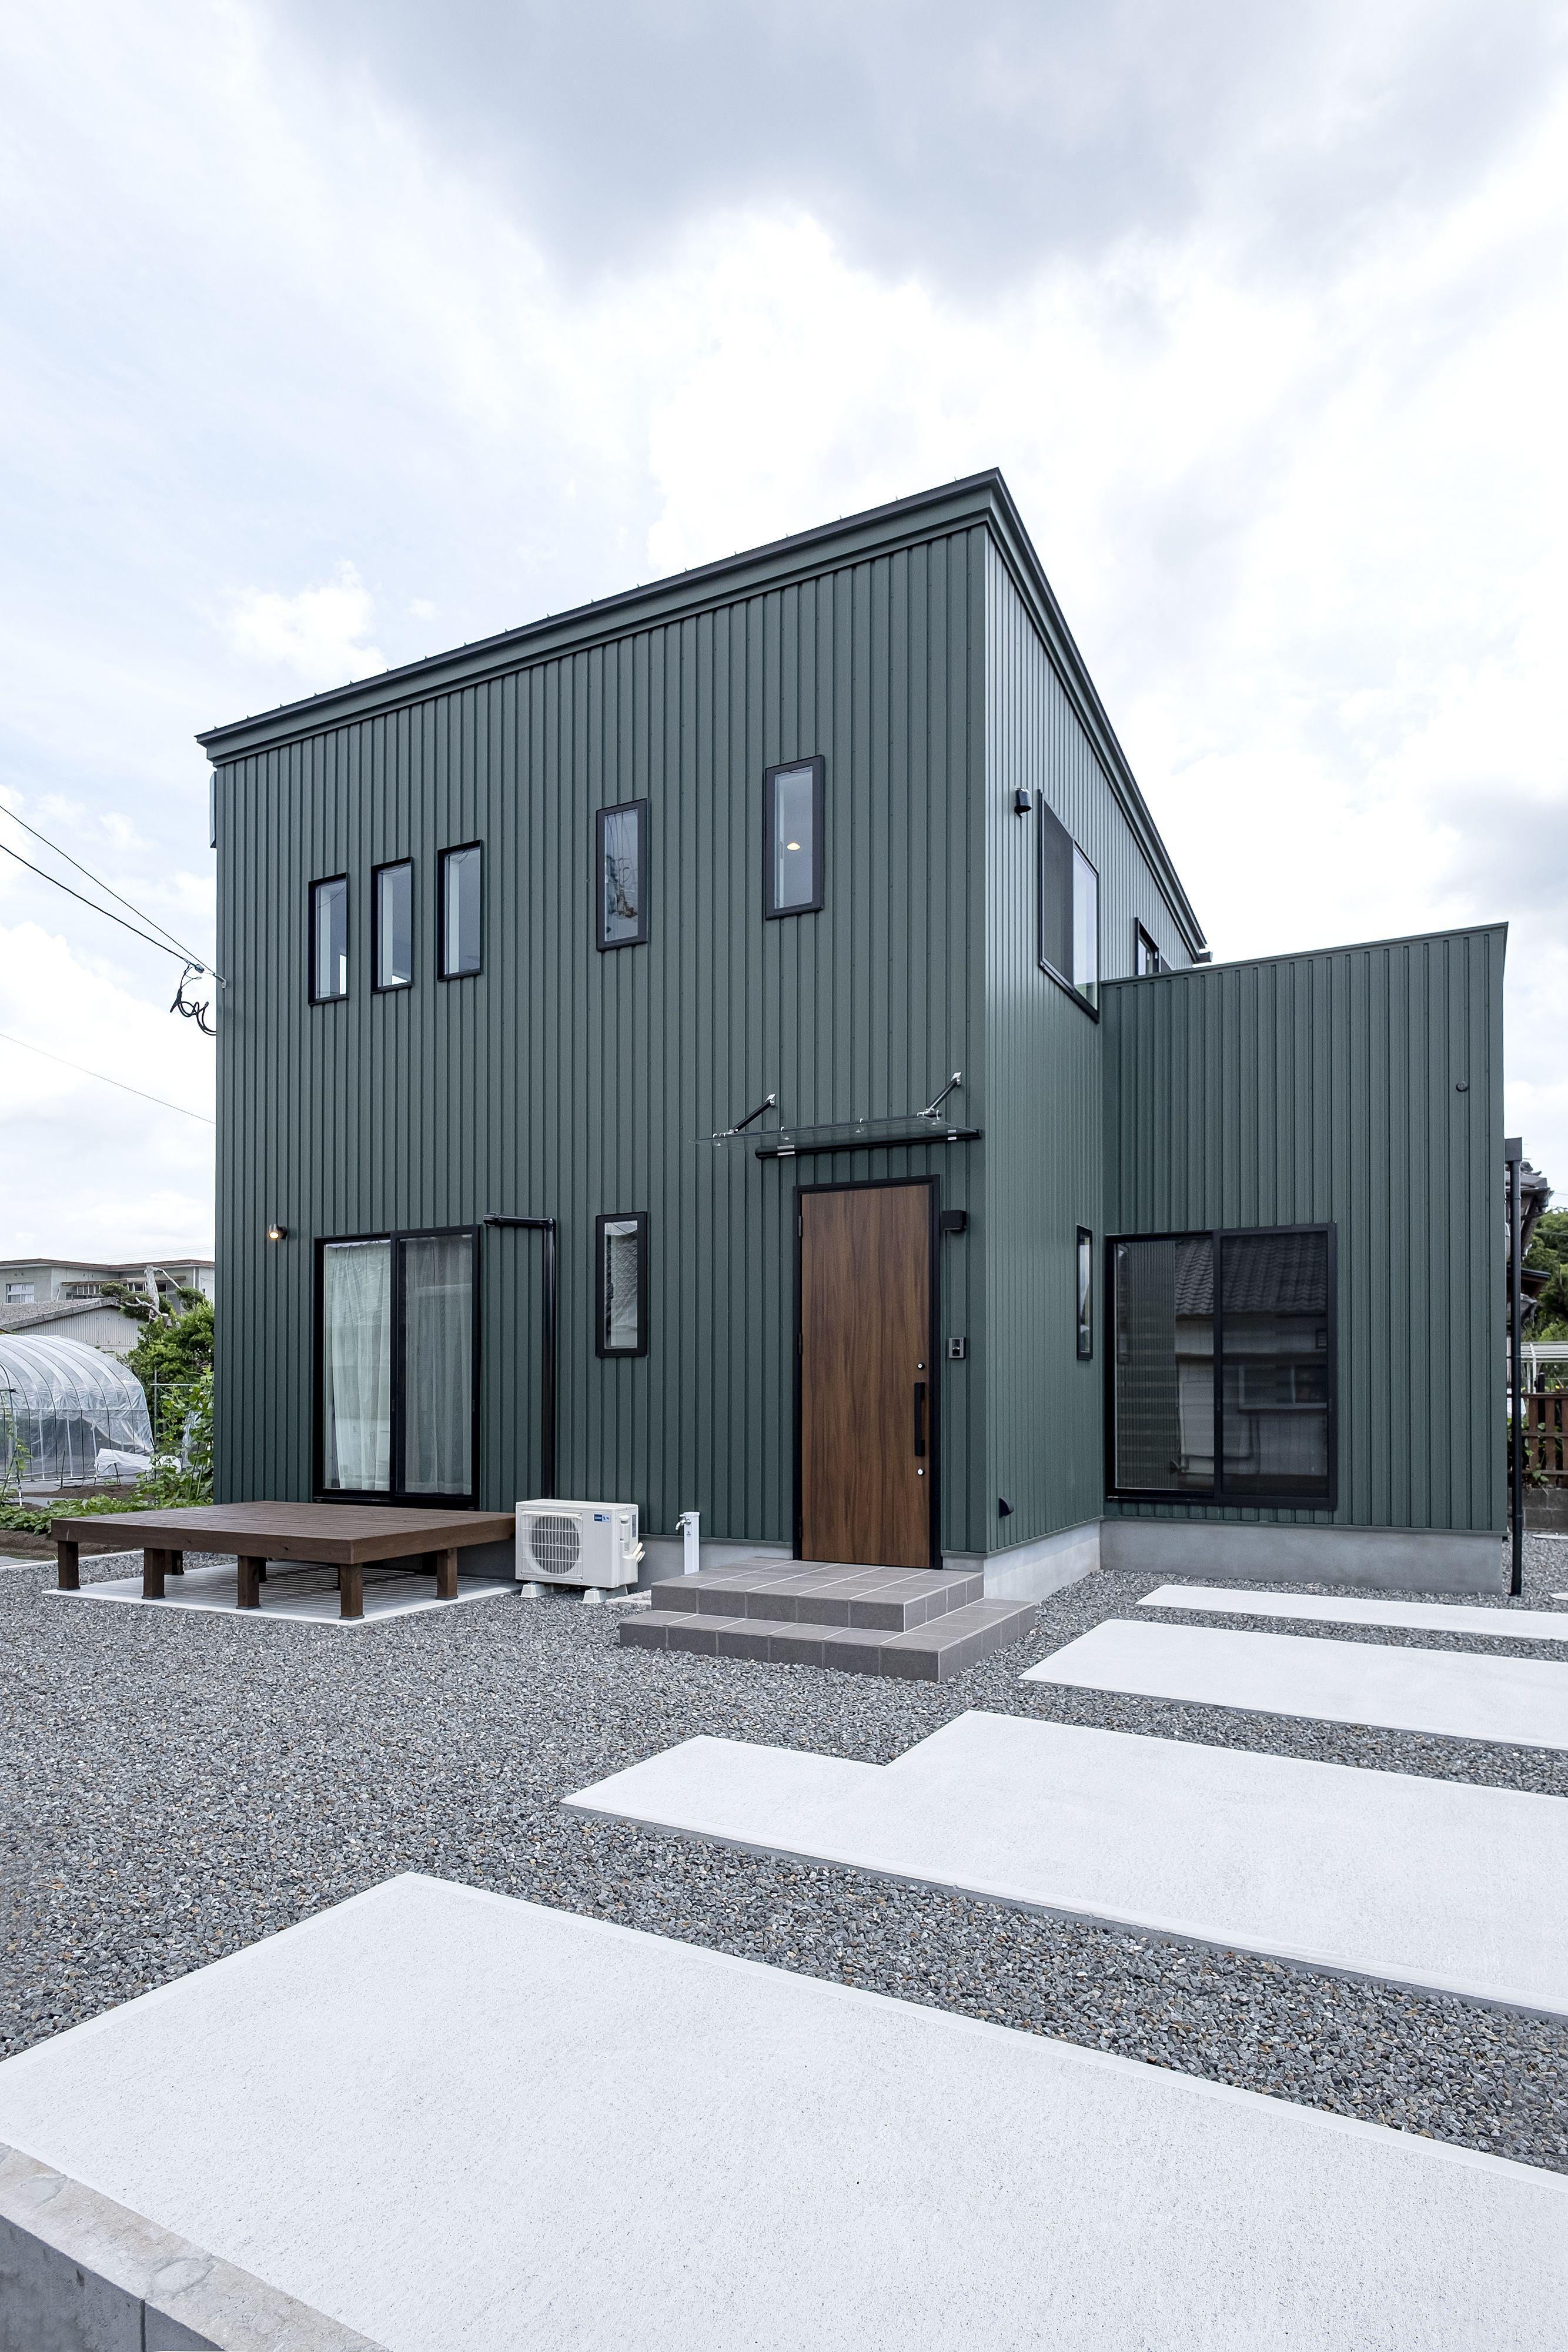 Woodbox ローコスト住宅 住宅 外観 日本 住宅